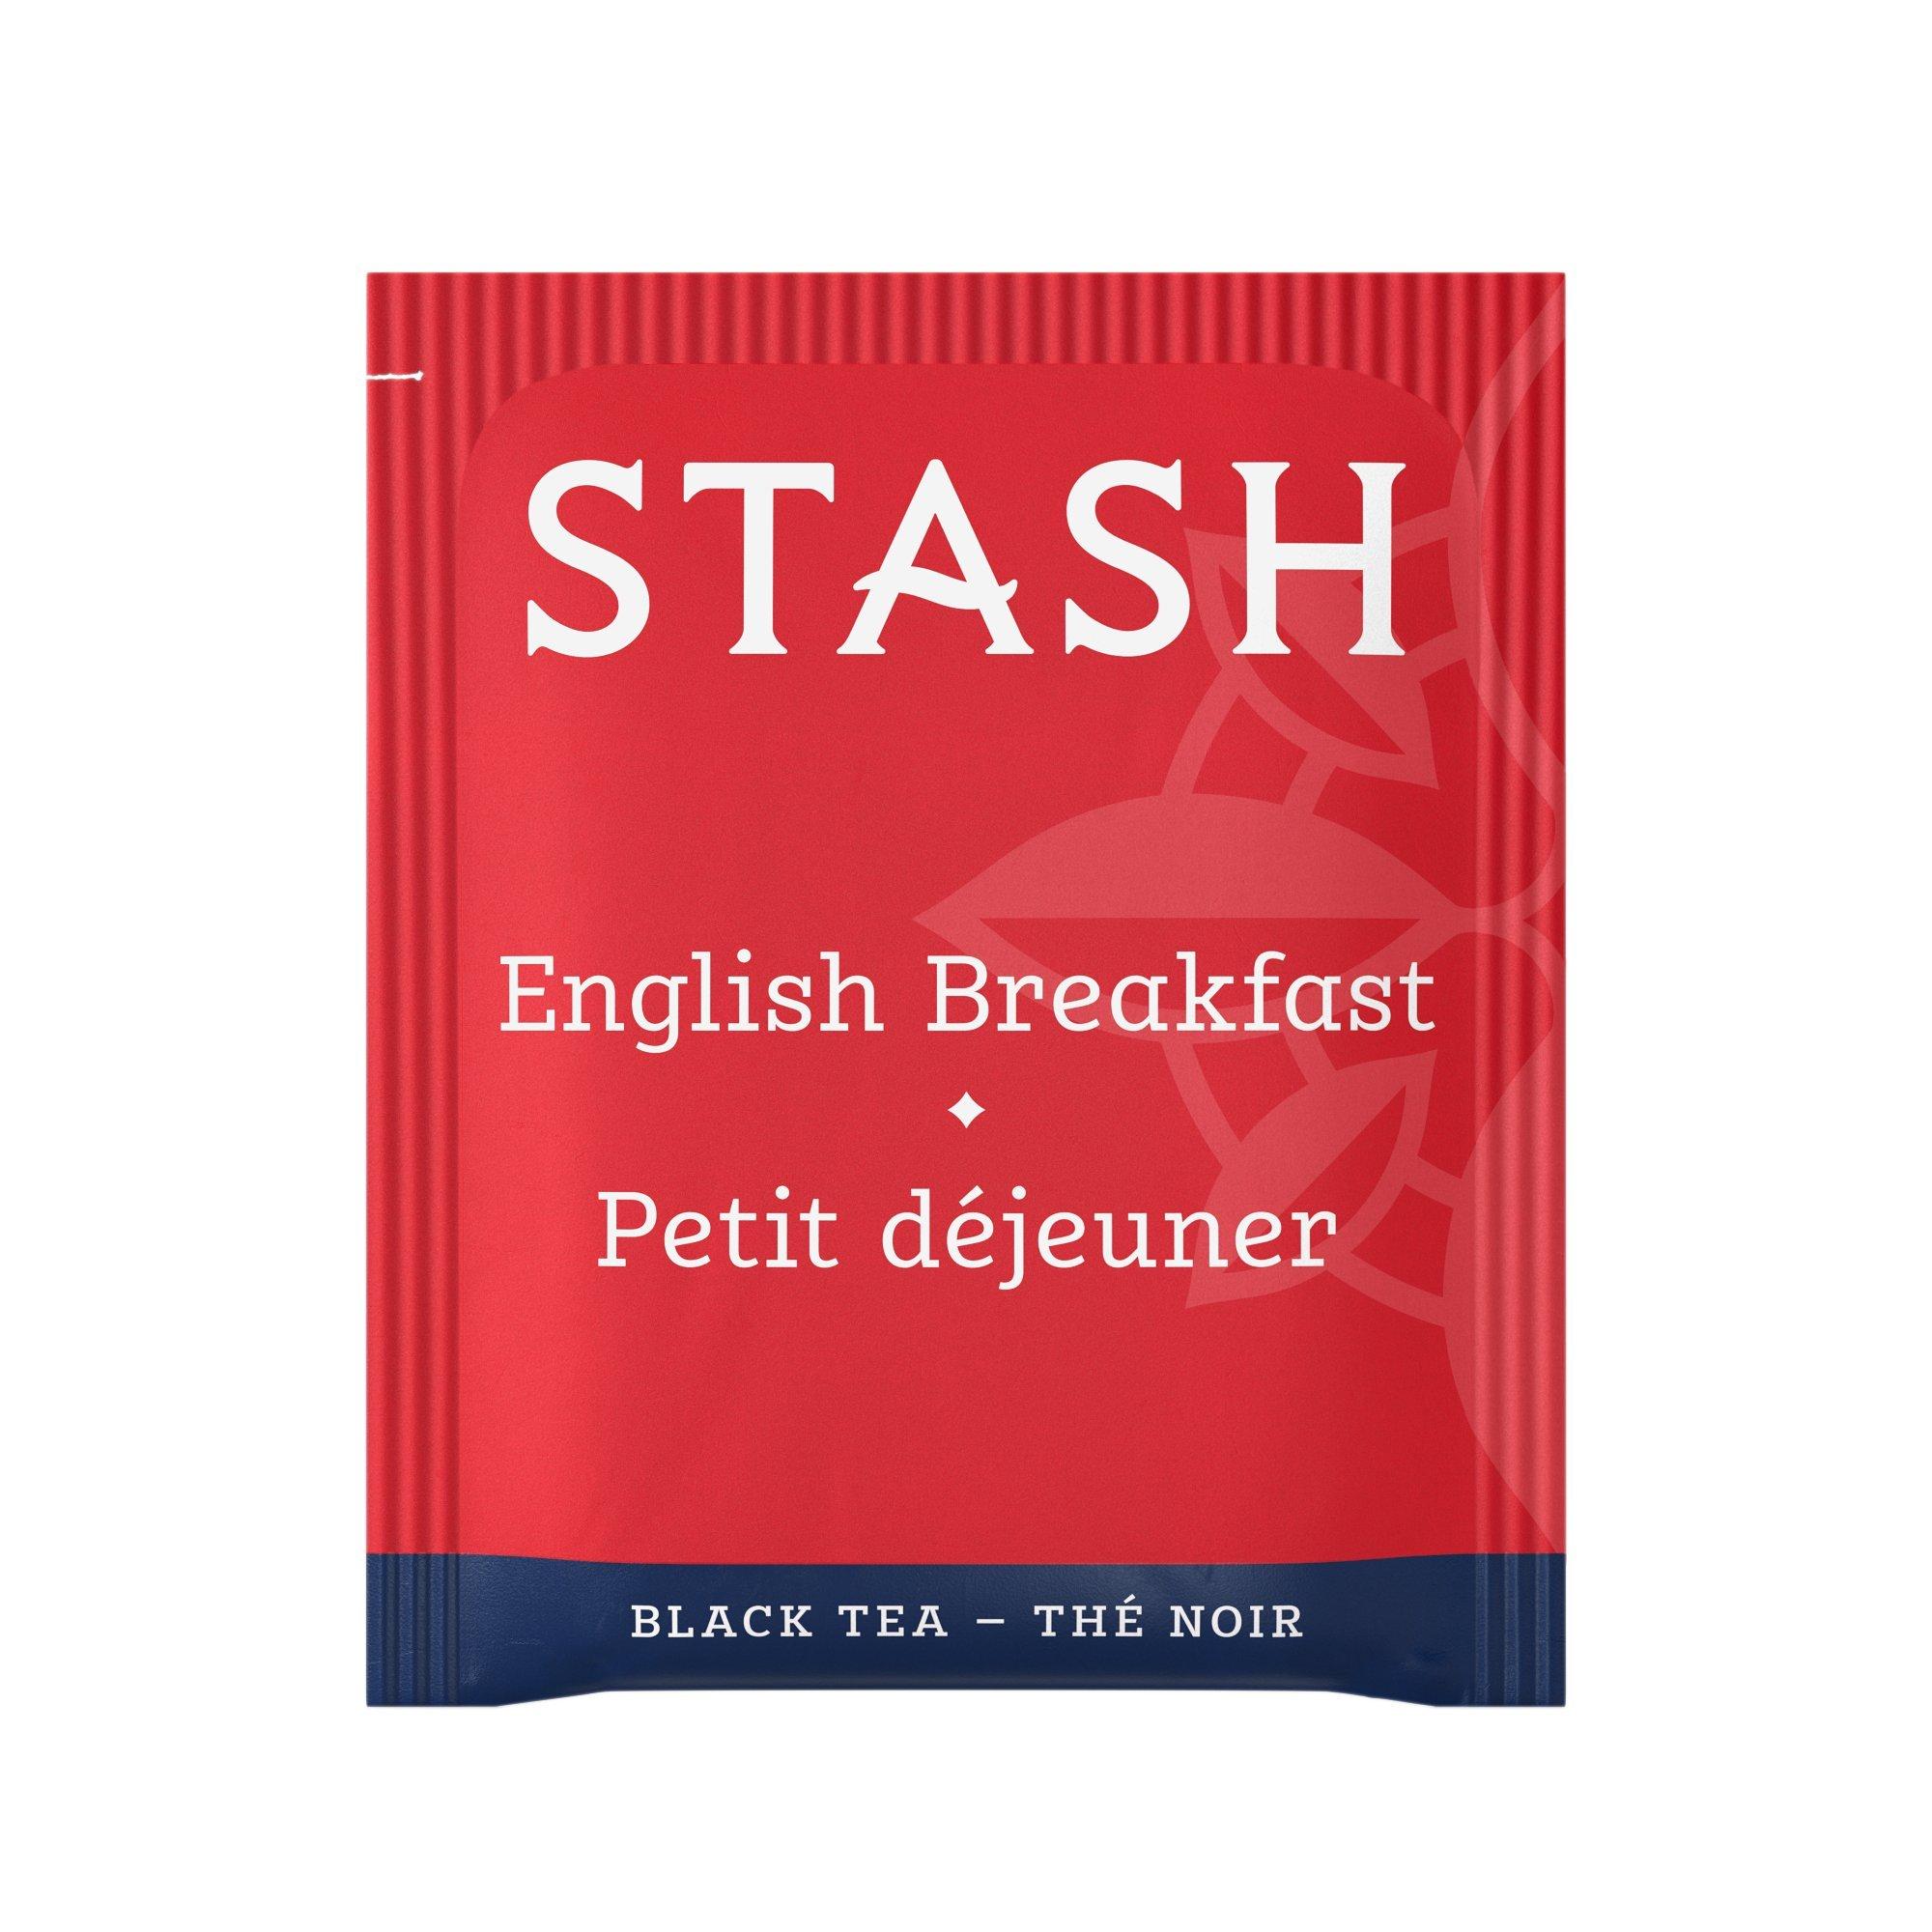 Stash Tea English Breakfast Black Tea 1000 Count Box of Tea Bags in Foil by Stash Tea (Image #2)